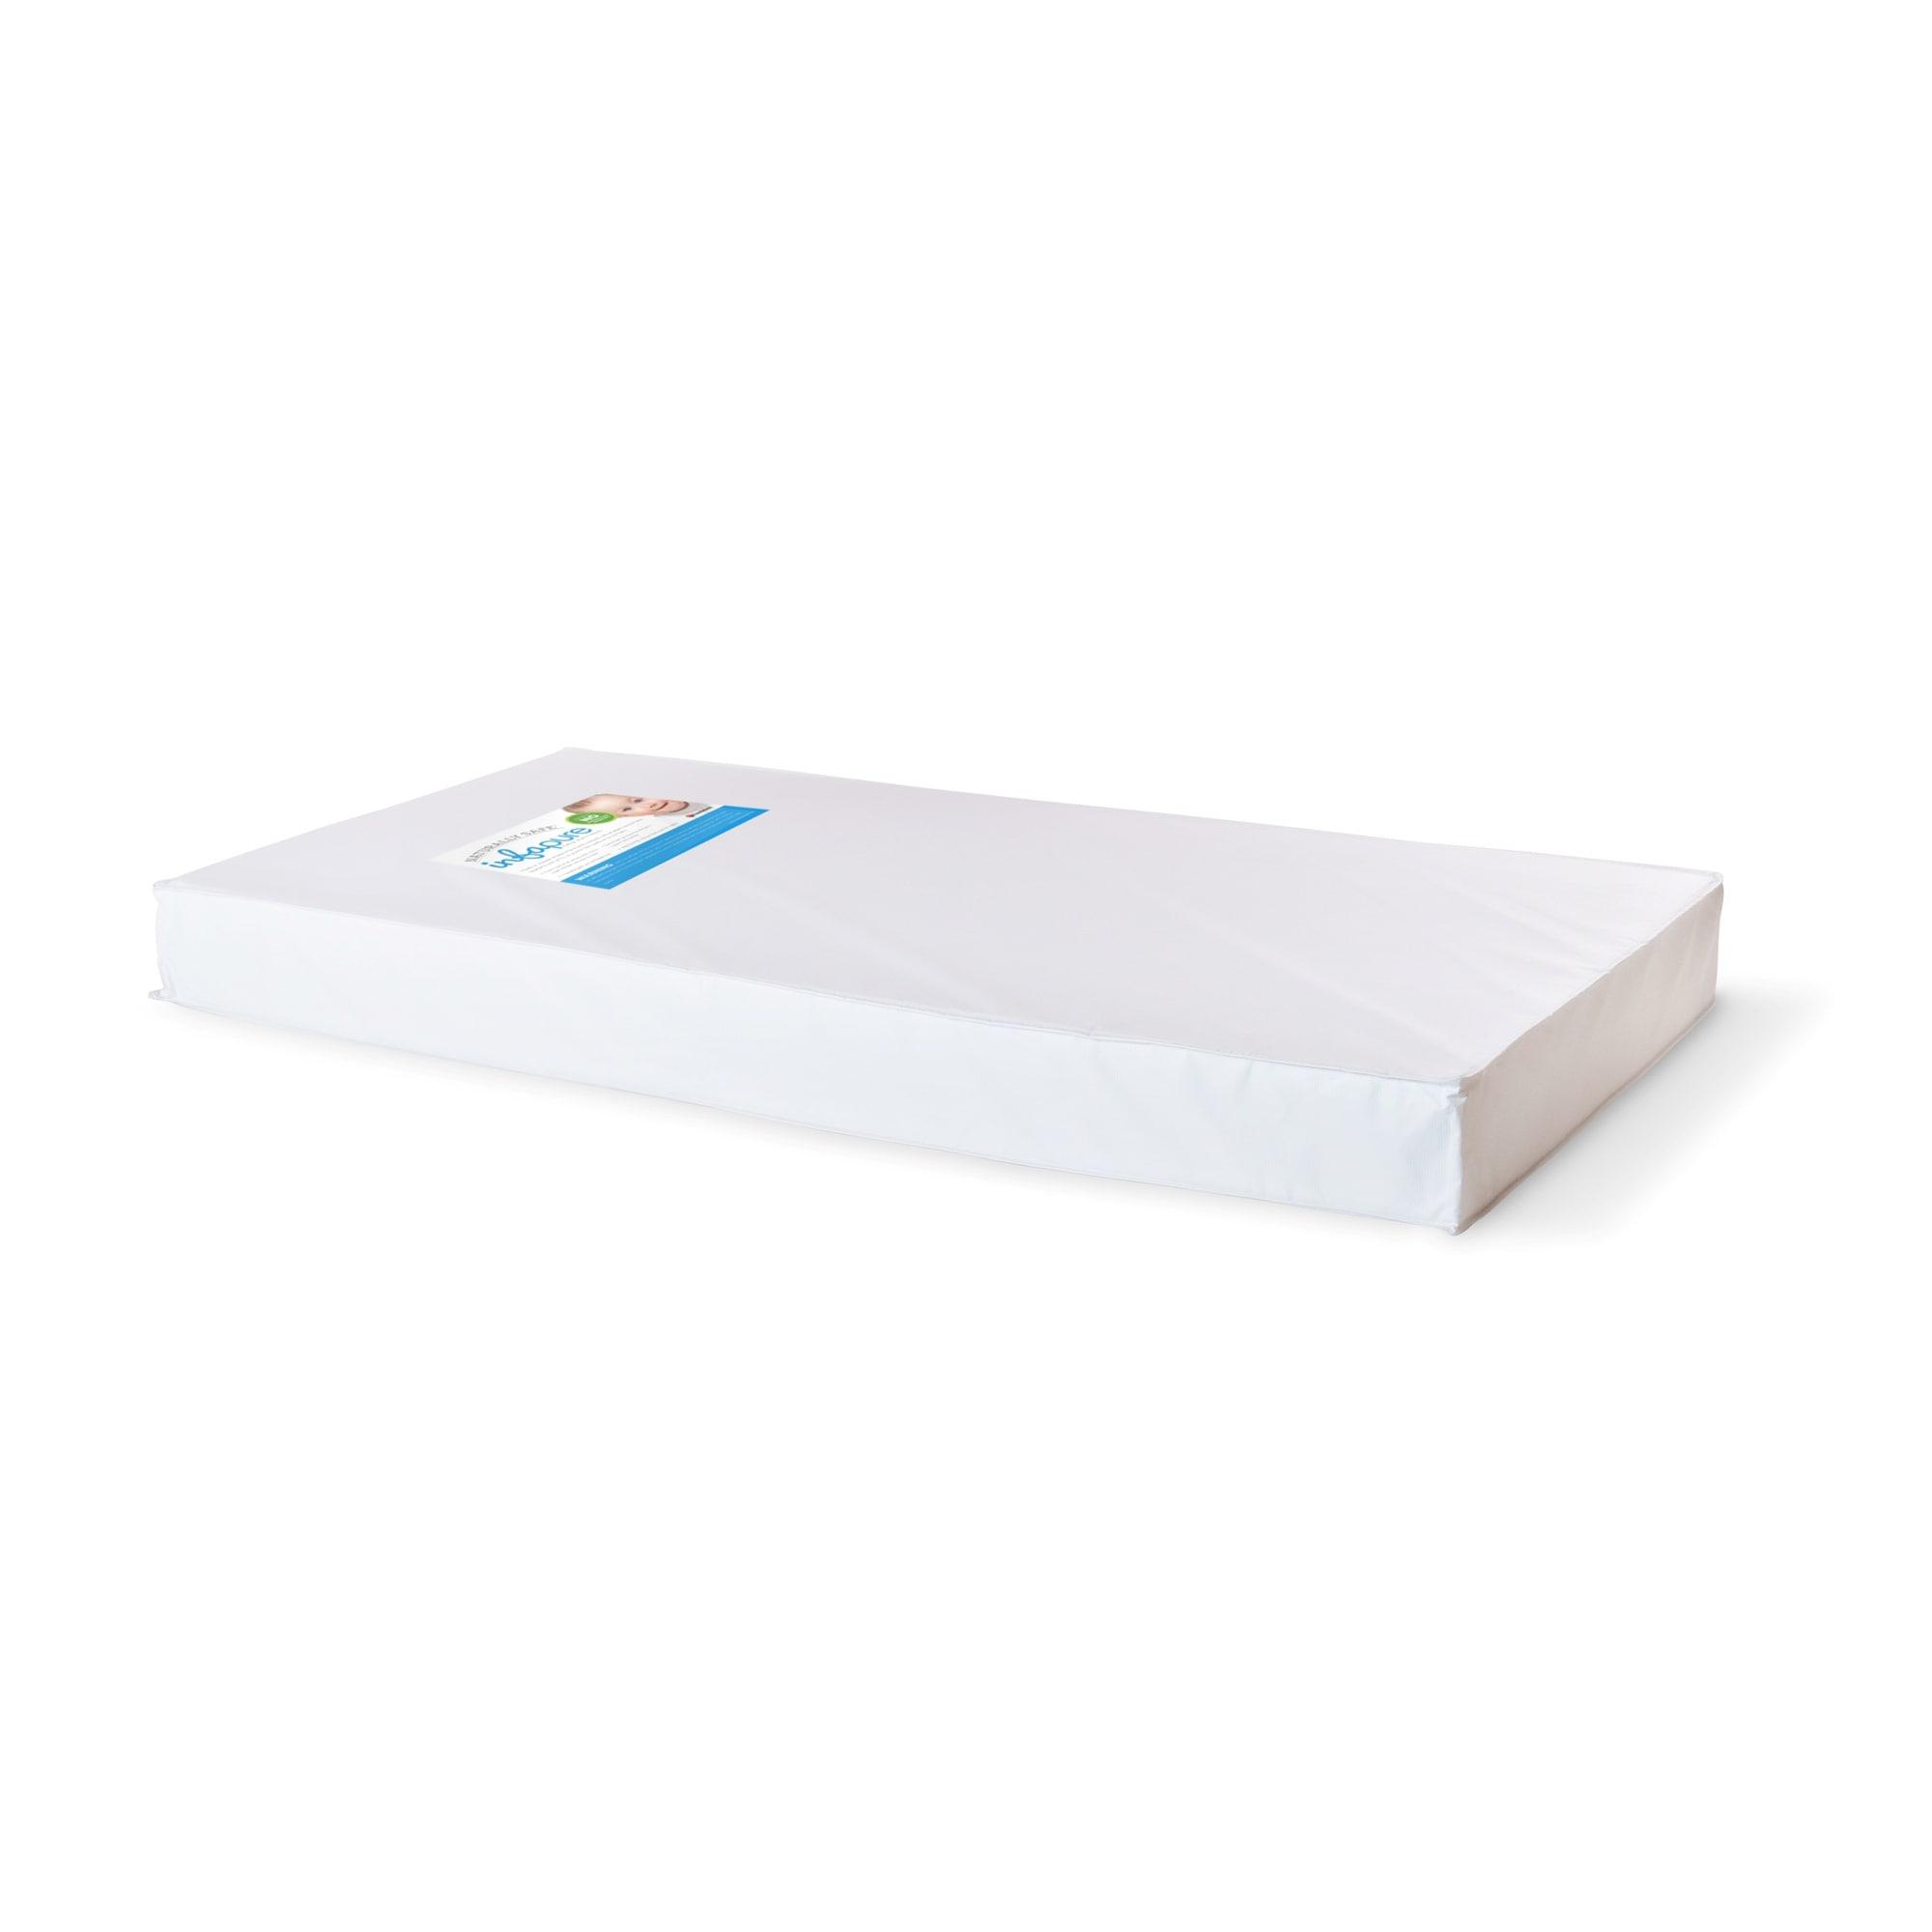 Shop Foundations InfaPure 5 inch Full Crib Mattress   Free